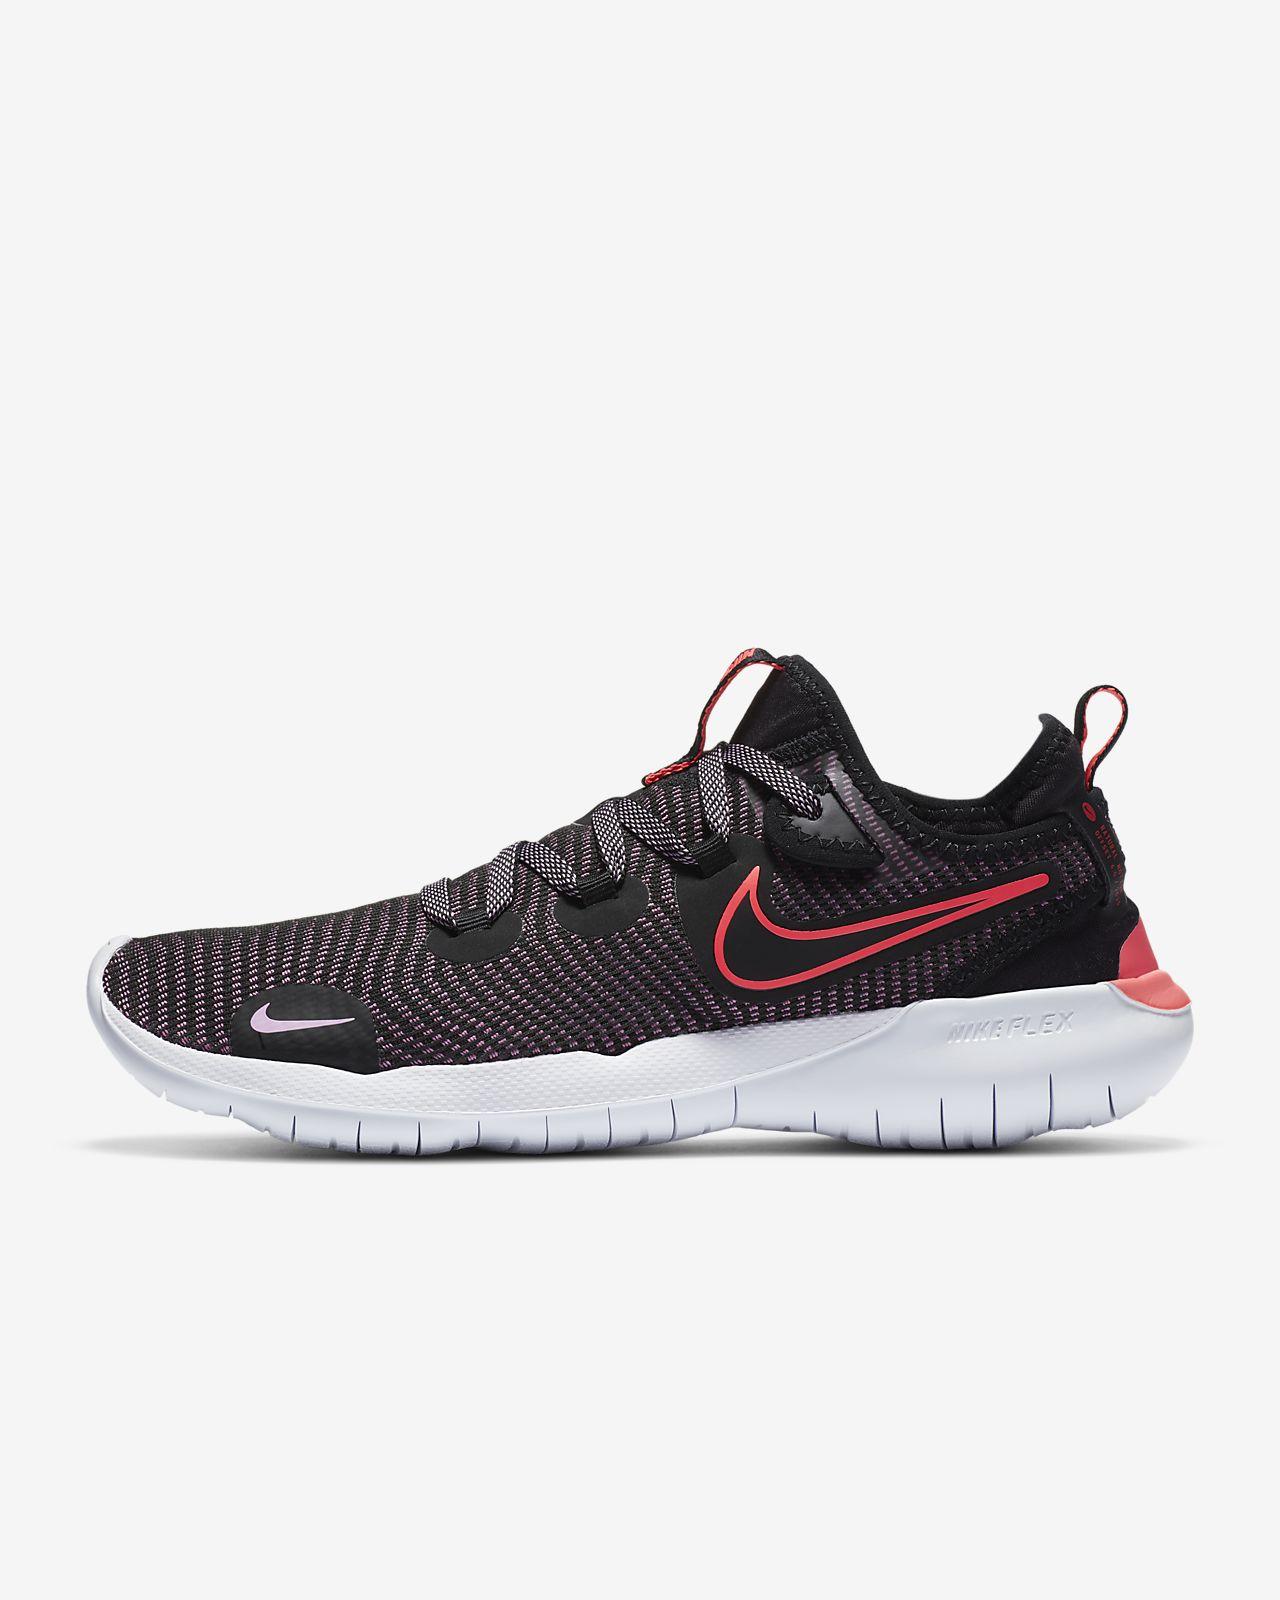 Calzado de running para mujer Nike Flex RN 2020